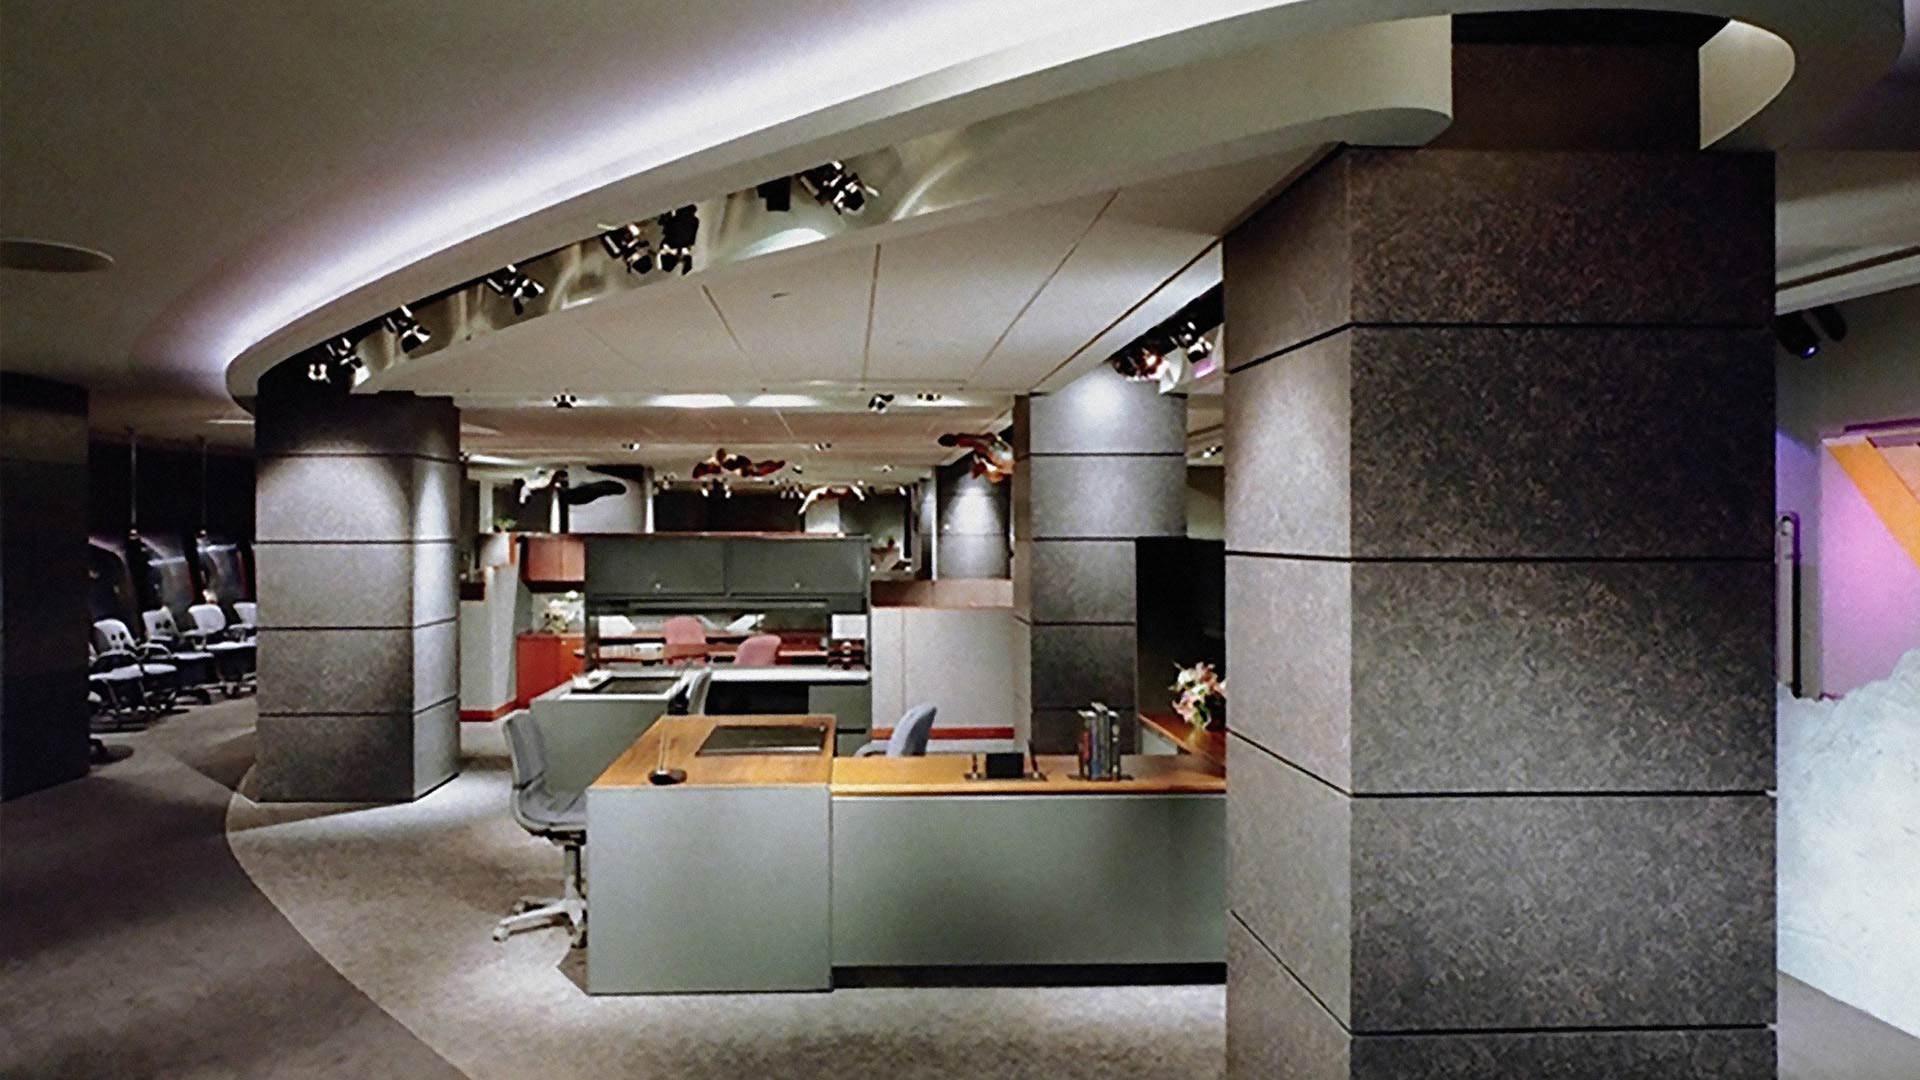 Universities Offer Interior Design